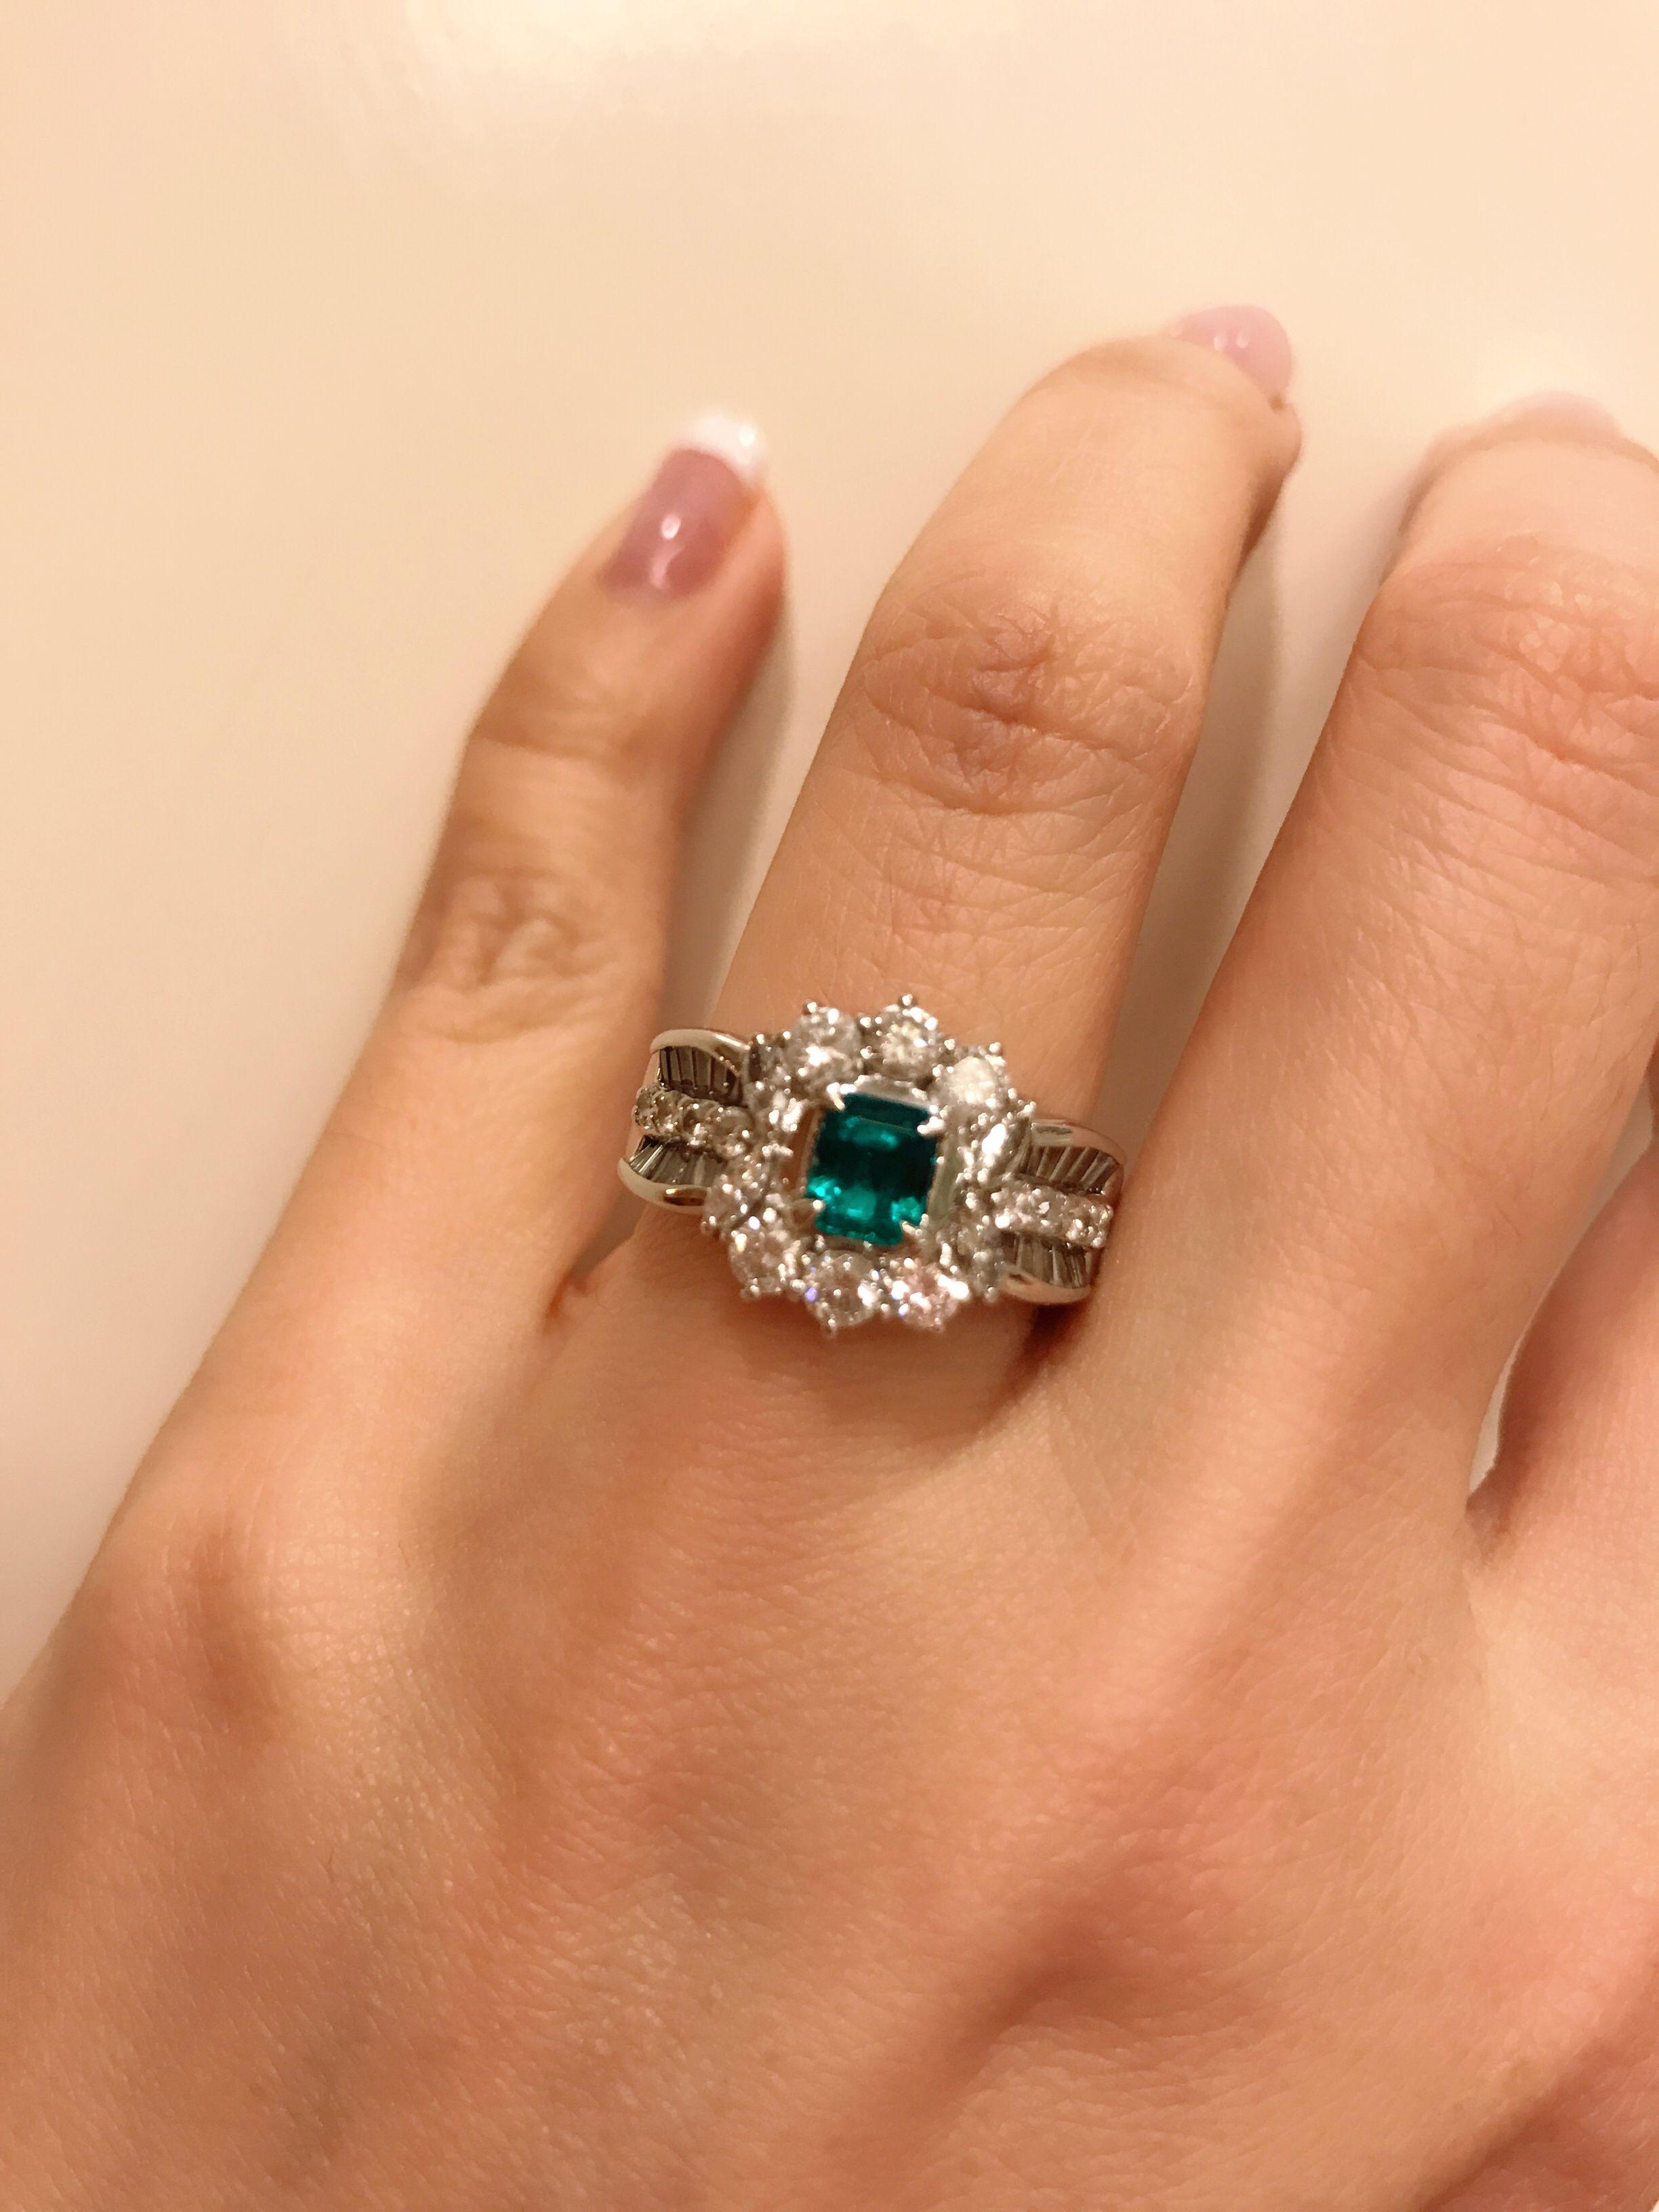 Vivid Green Emerald And Diamond Ring Set In Platinum Emeralds In